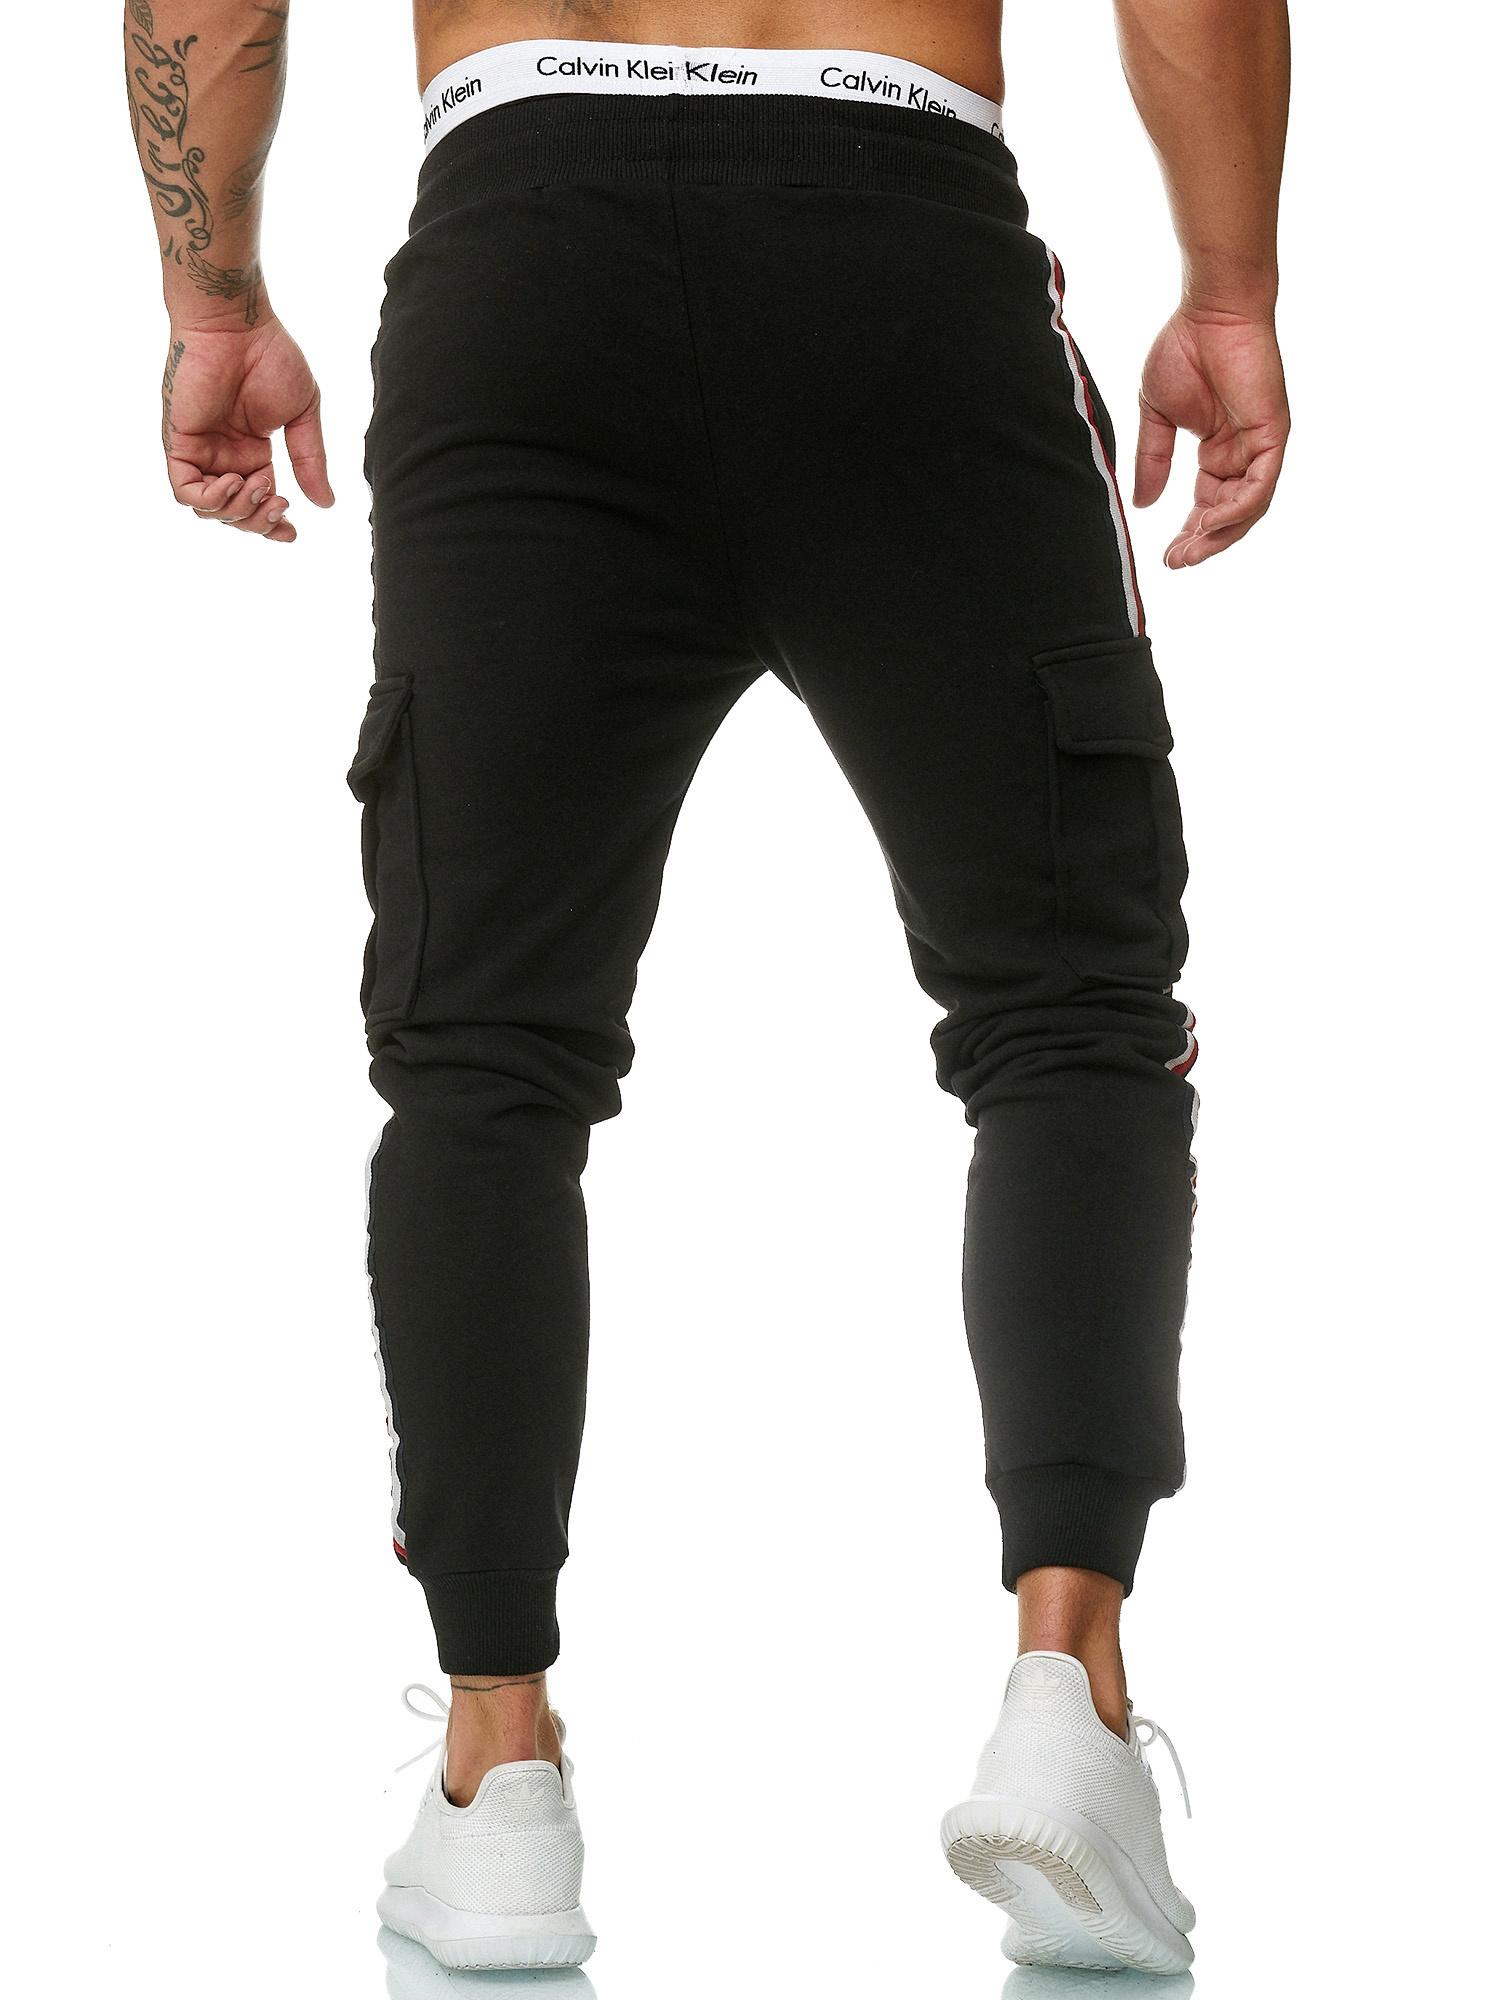 Joggingbroek | Streep Rood Wit | Pocket | Slim-fit | Zwart